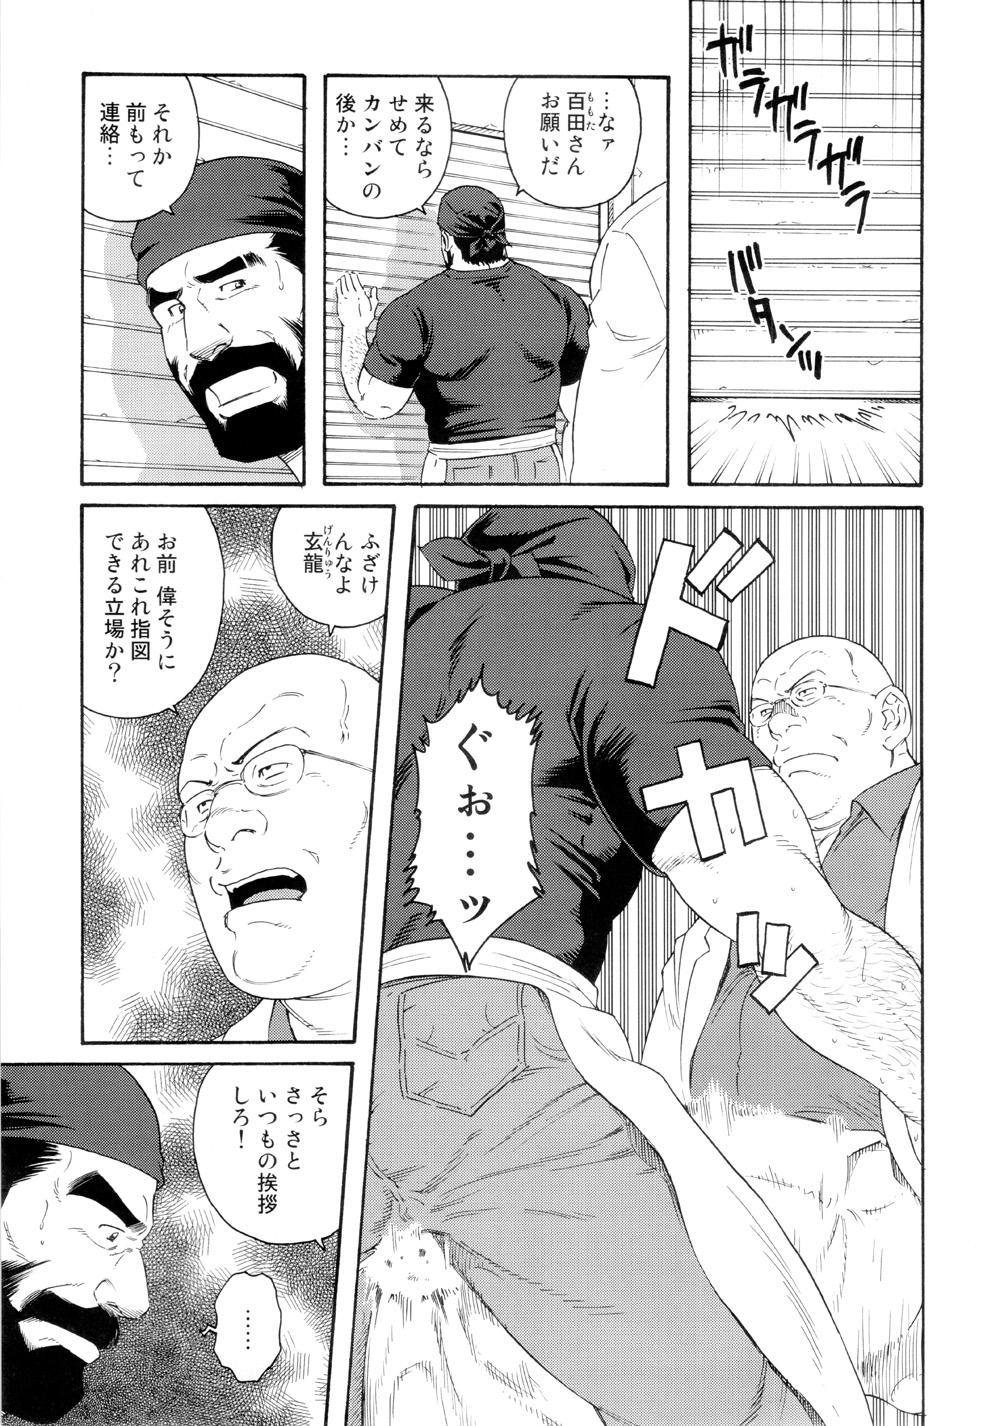 Genryu Chapter 1 4